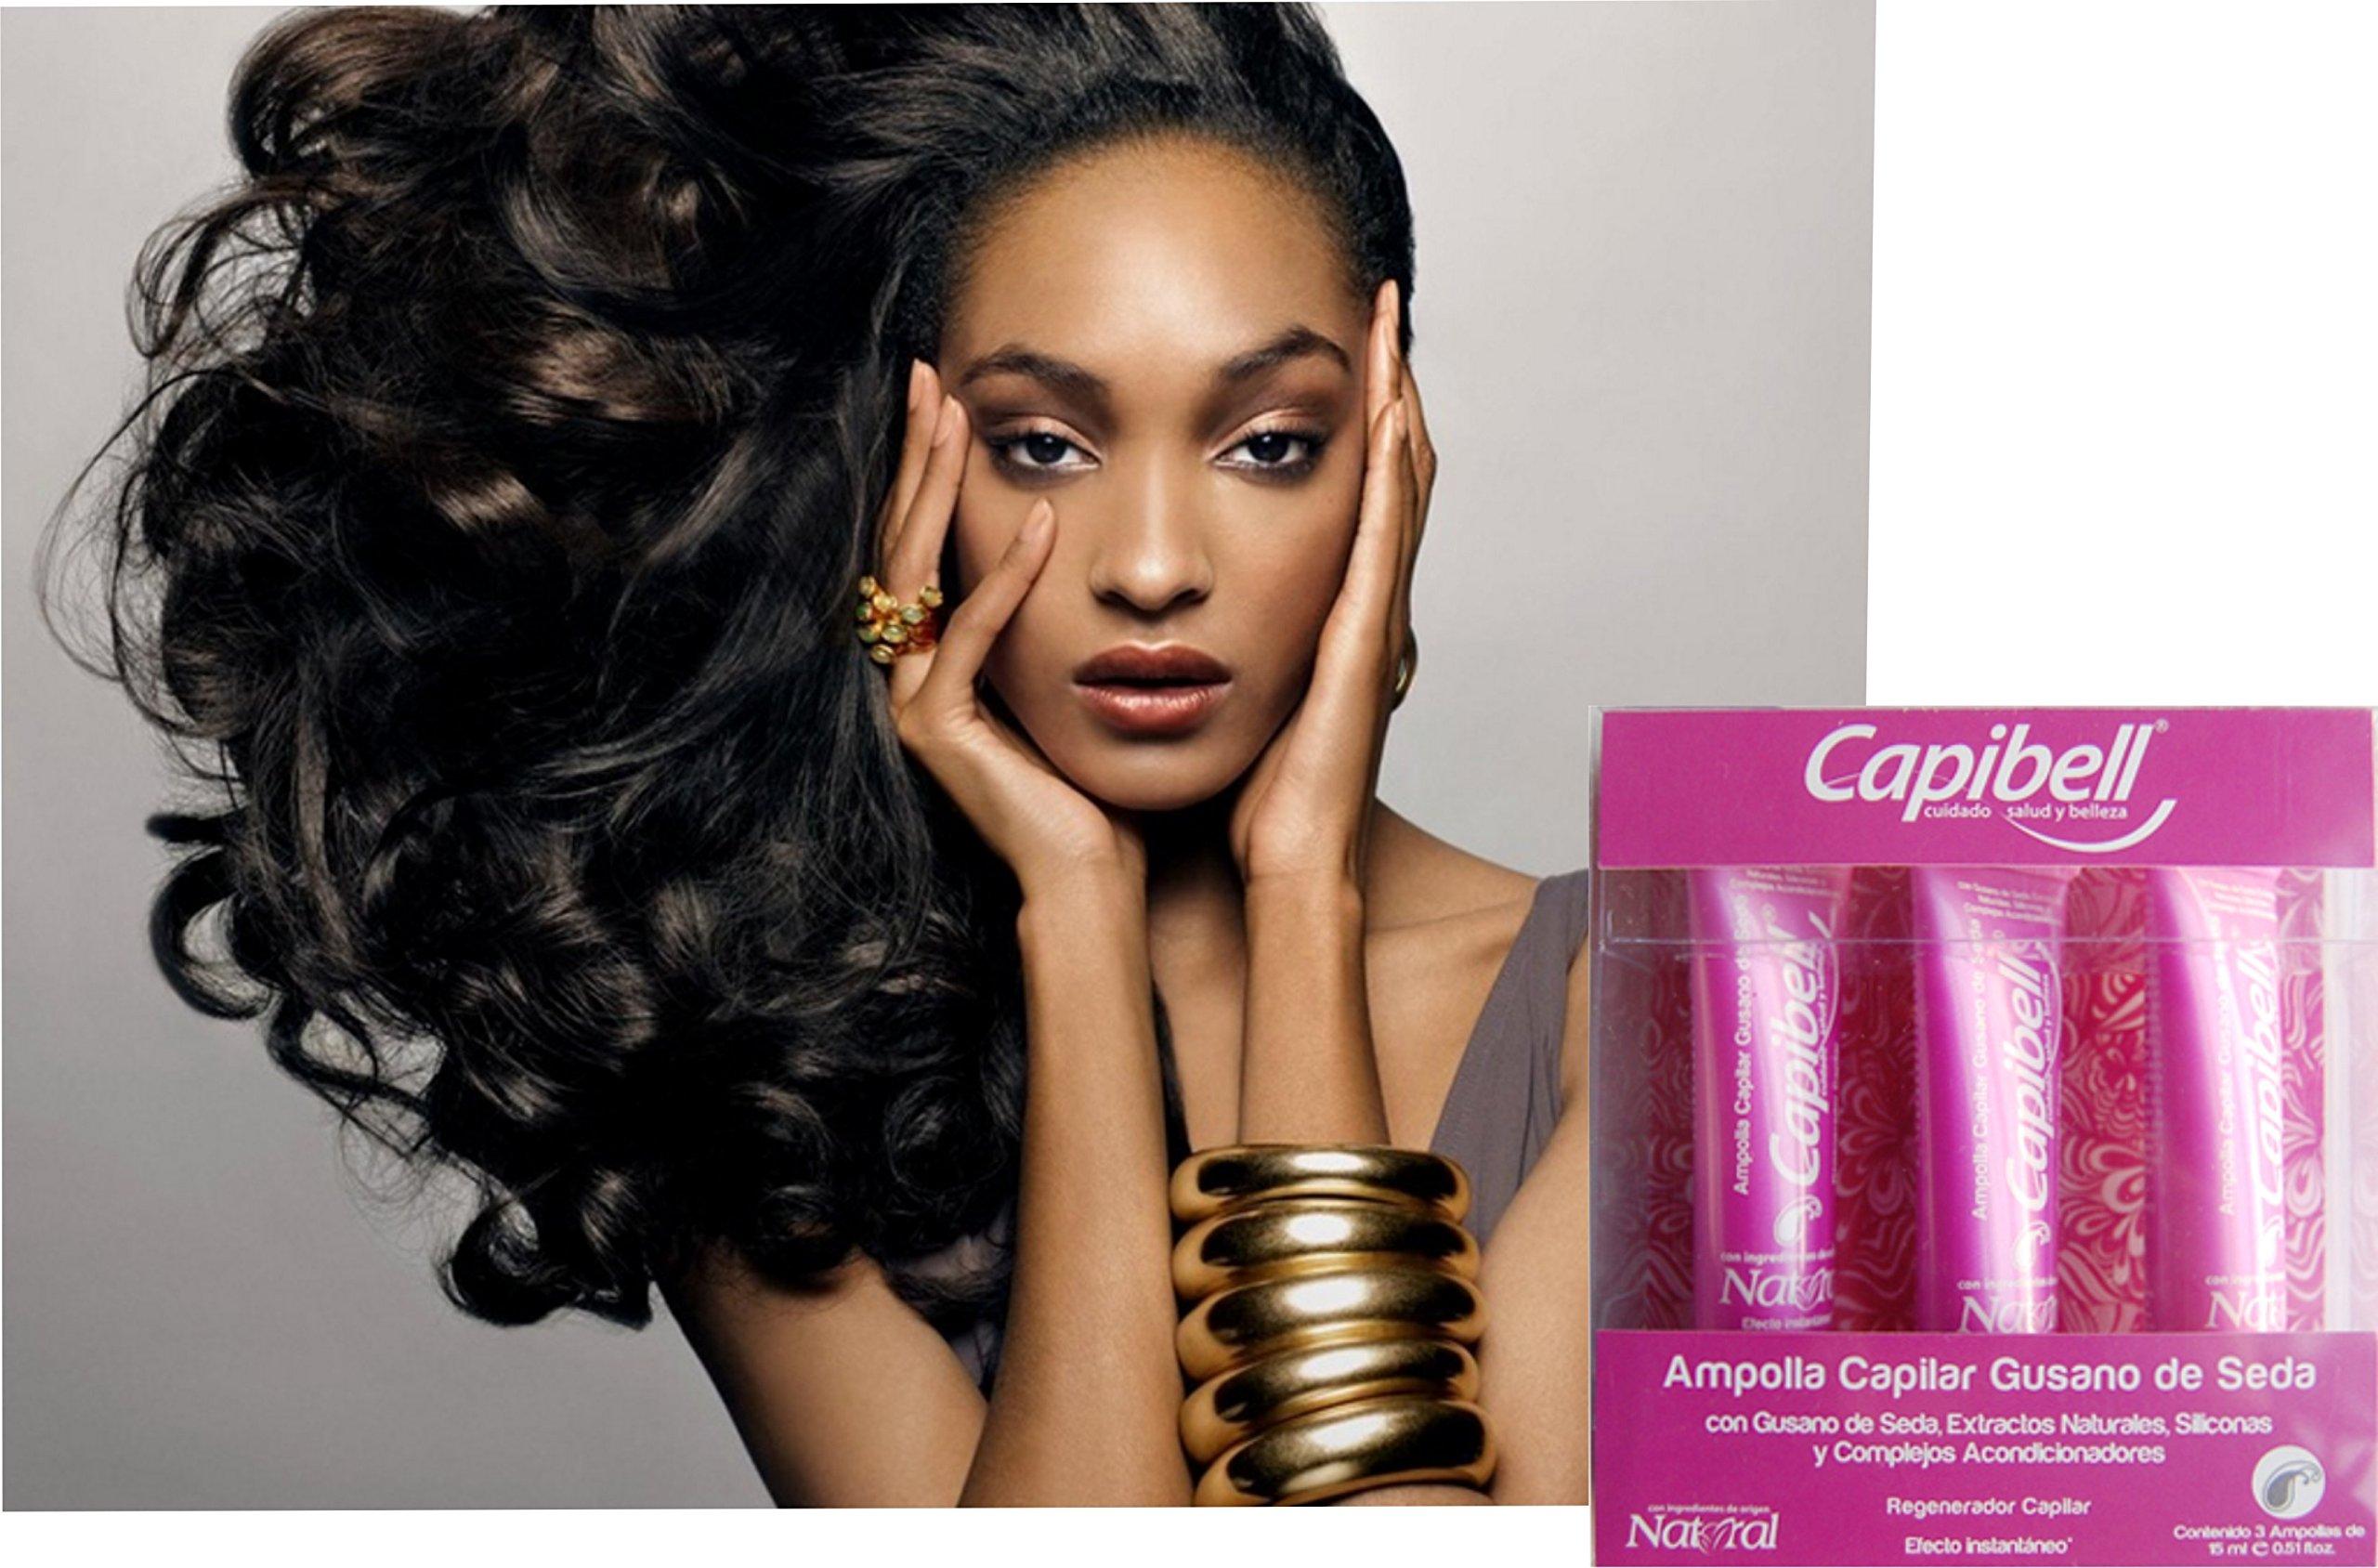 Amazon.com : CAPIBELL-Gusano de seda/Ampolla protector del tallo del cabello (BOX 3PCS) : Beauty